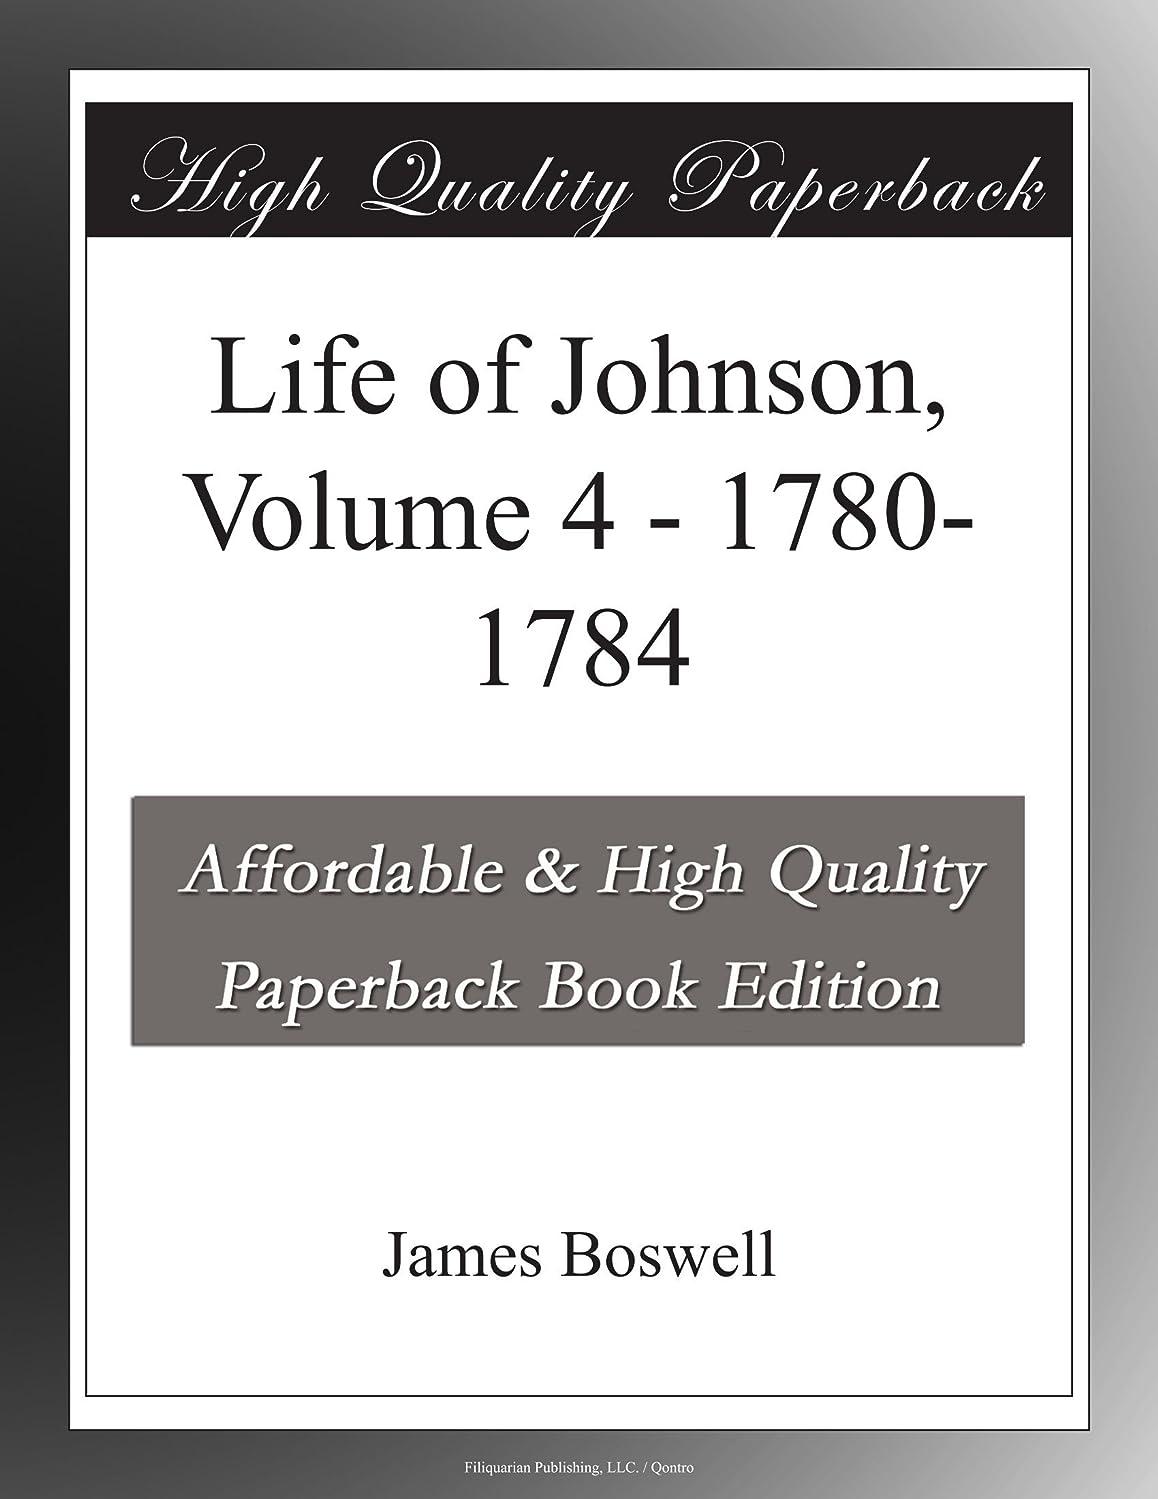 Life of Johnson, Volume 4 - 1780-1784